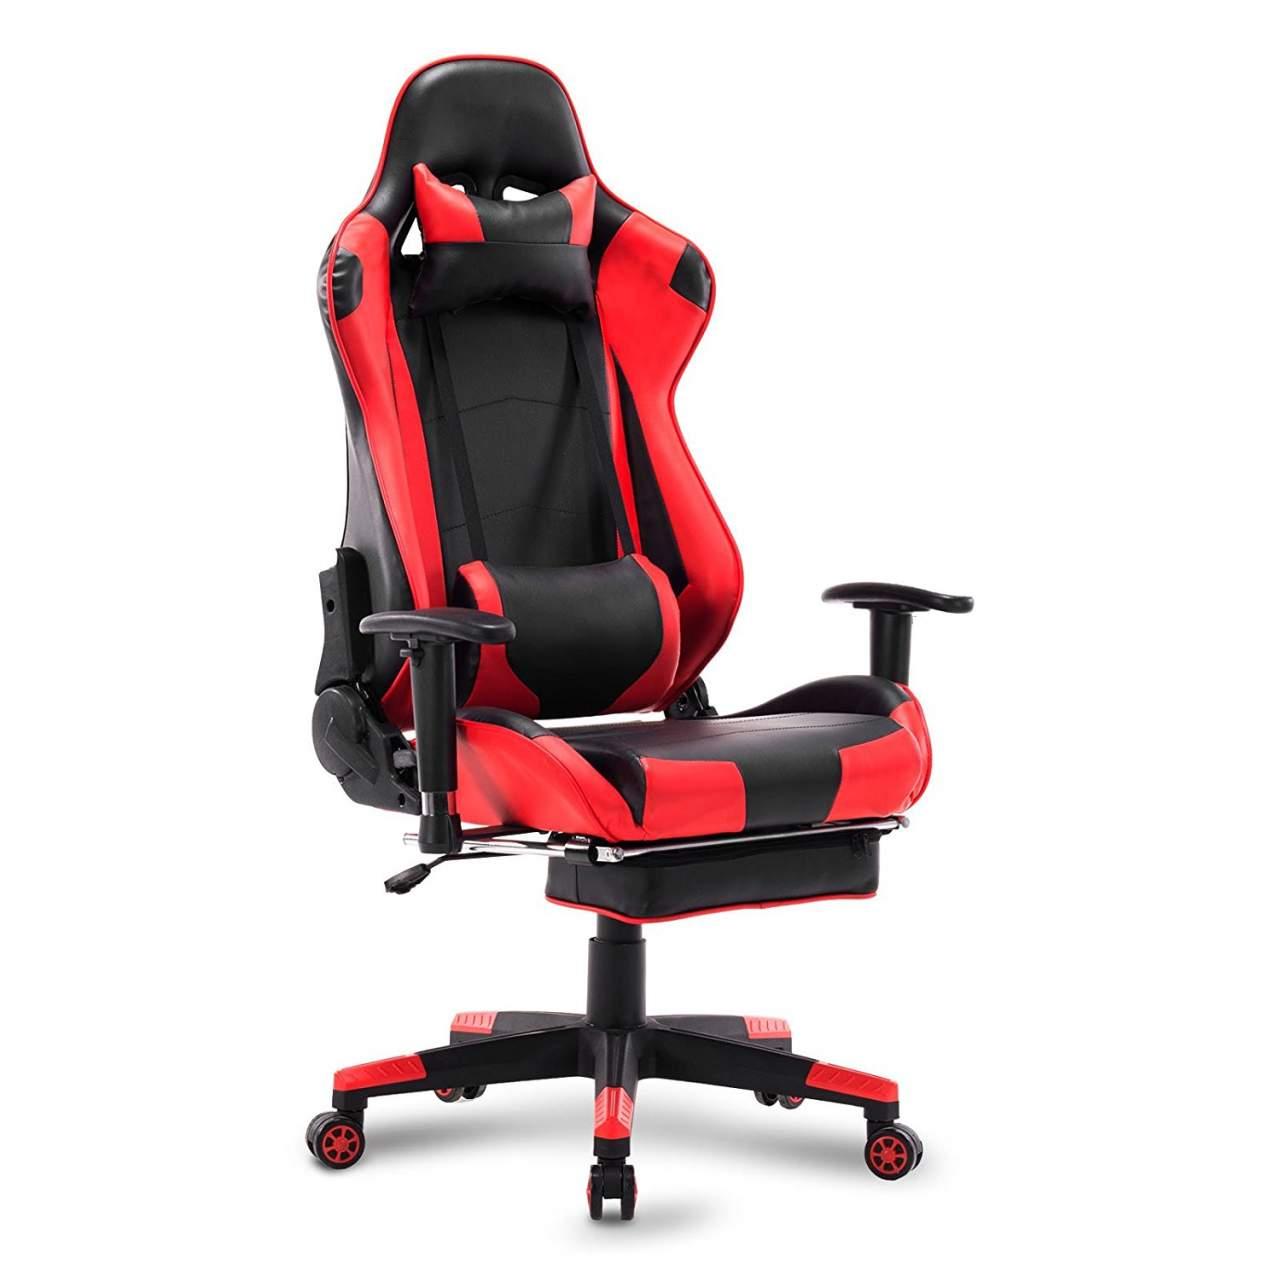 Design Racing Chefsessel Drehstuhl Bürostuhl Schreibtischstuhl Gaming Sportsitz